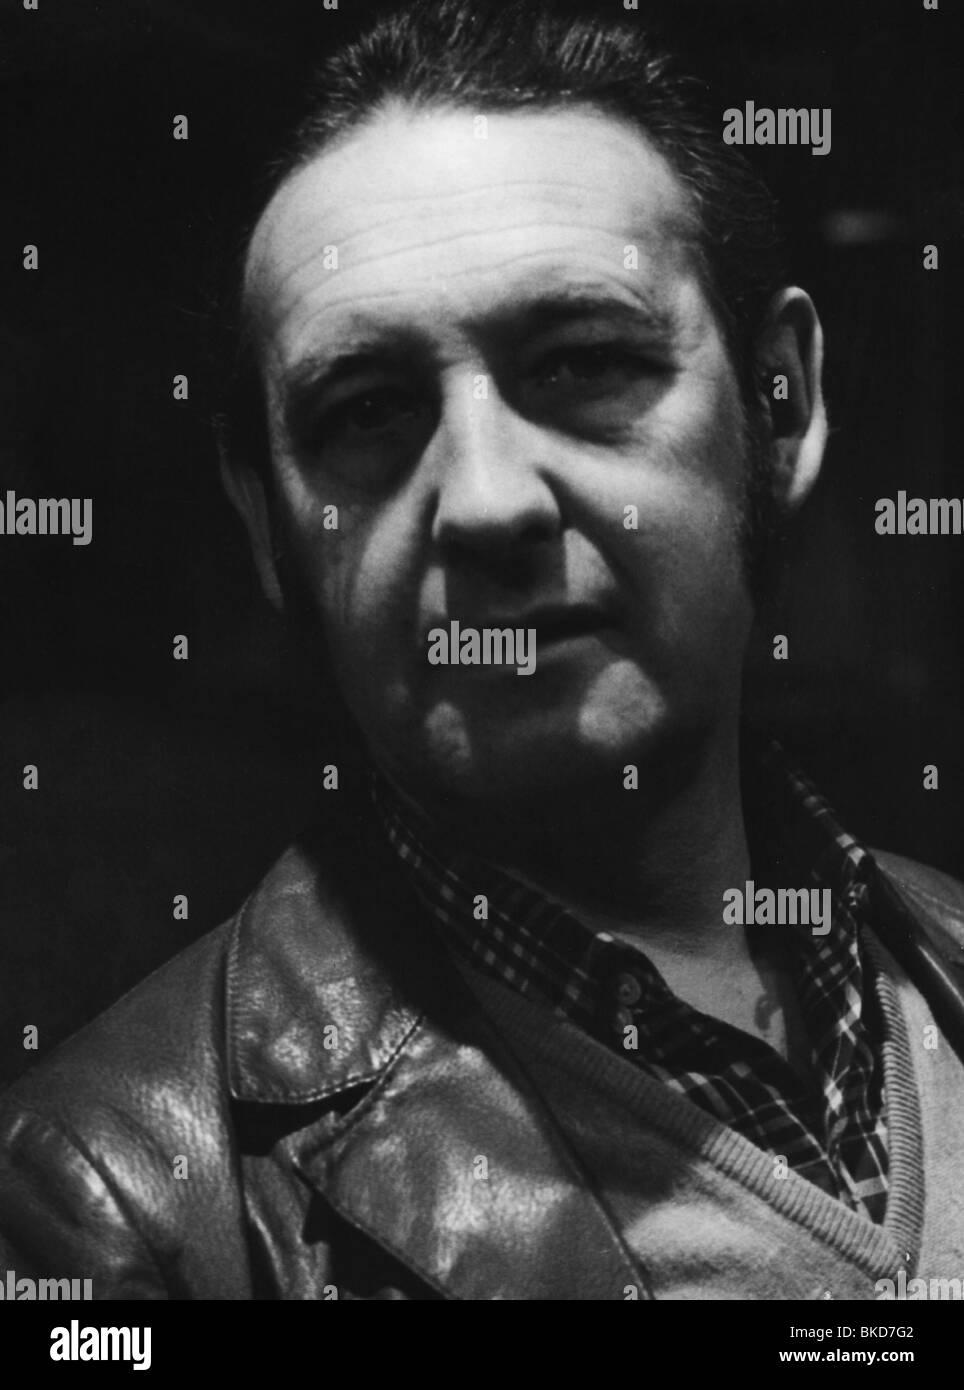 Wajda, Andrzej, 6.3.1926 - 9.10.2016, Polish director, portrait, circa 1978, 1970s, 70s, male, man, 1980s, 20th - Stock Image